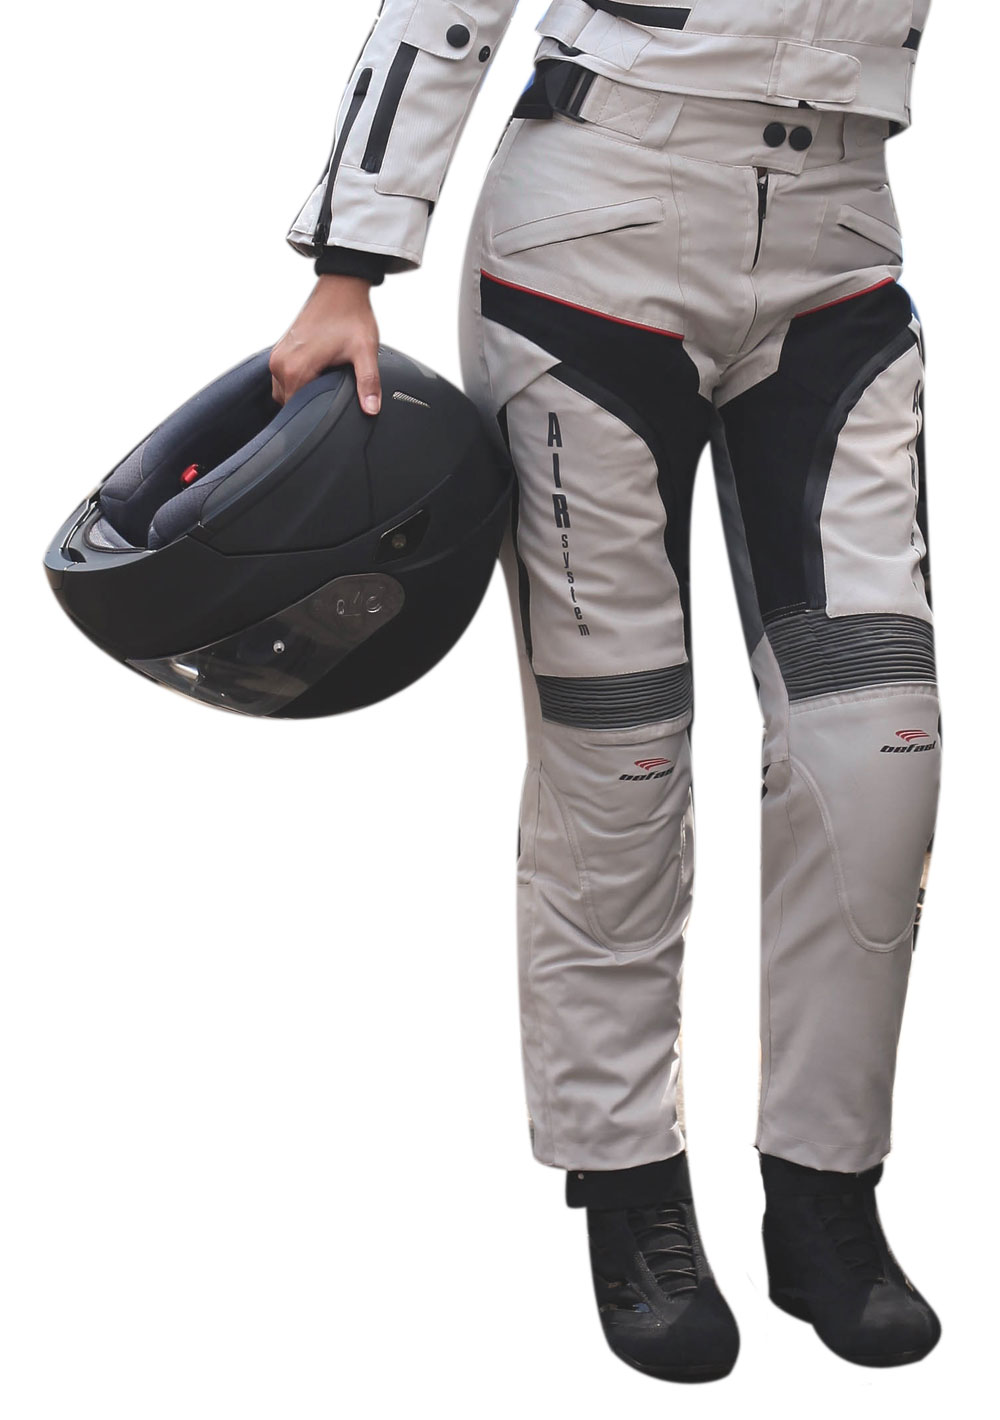 Pantaloni moto donna Befast Multiforce Lady con Air System Grigi